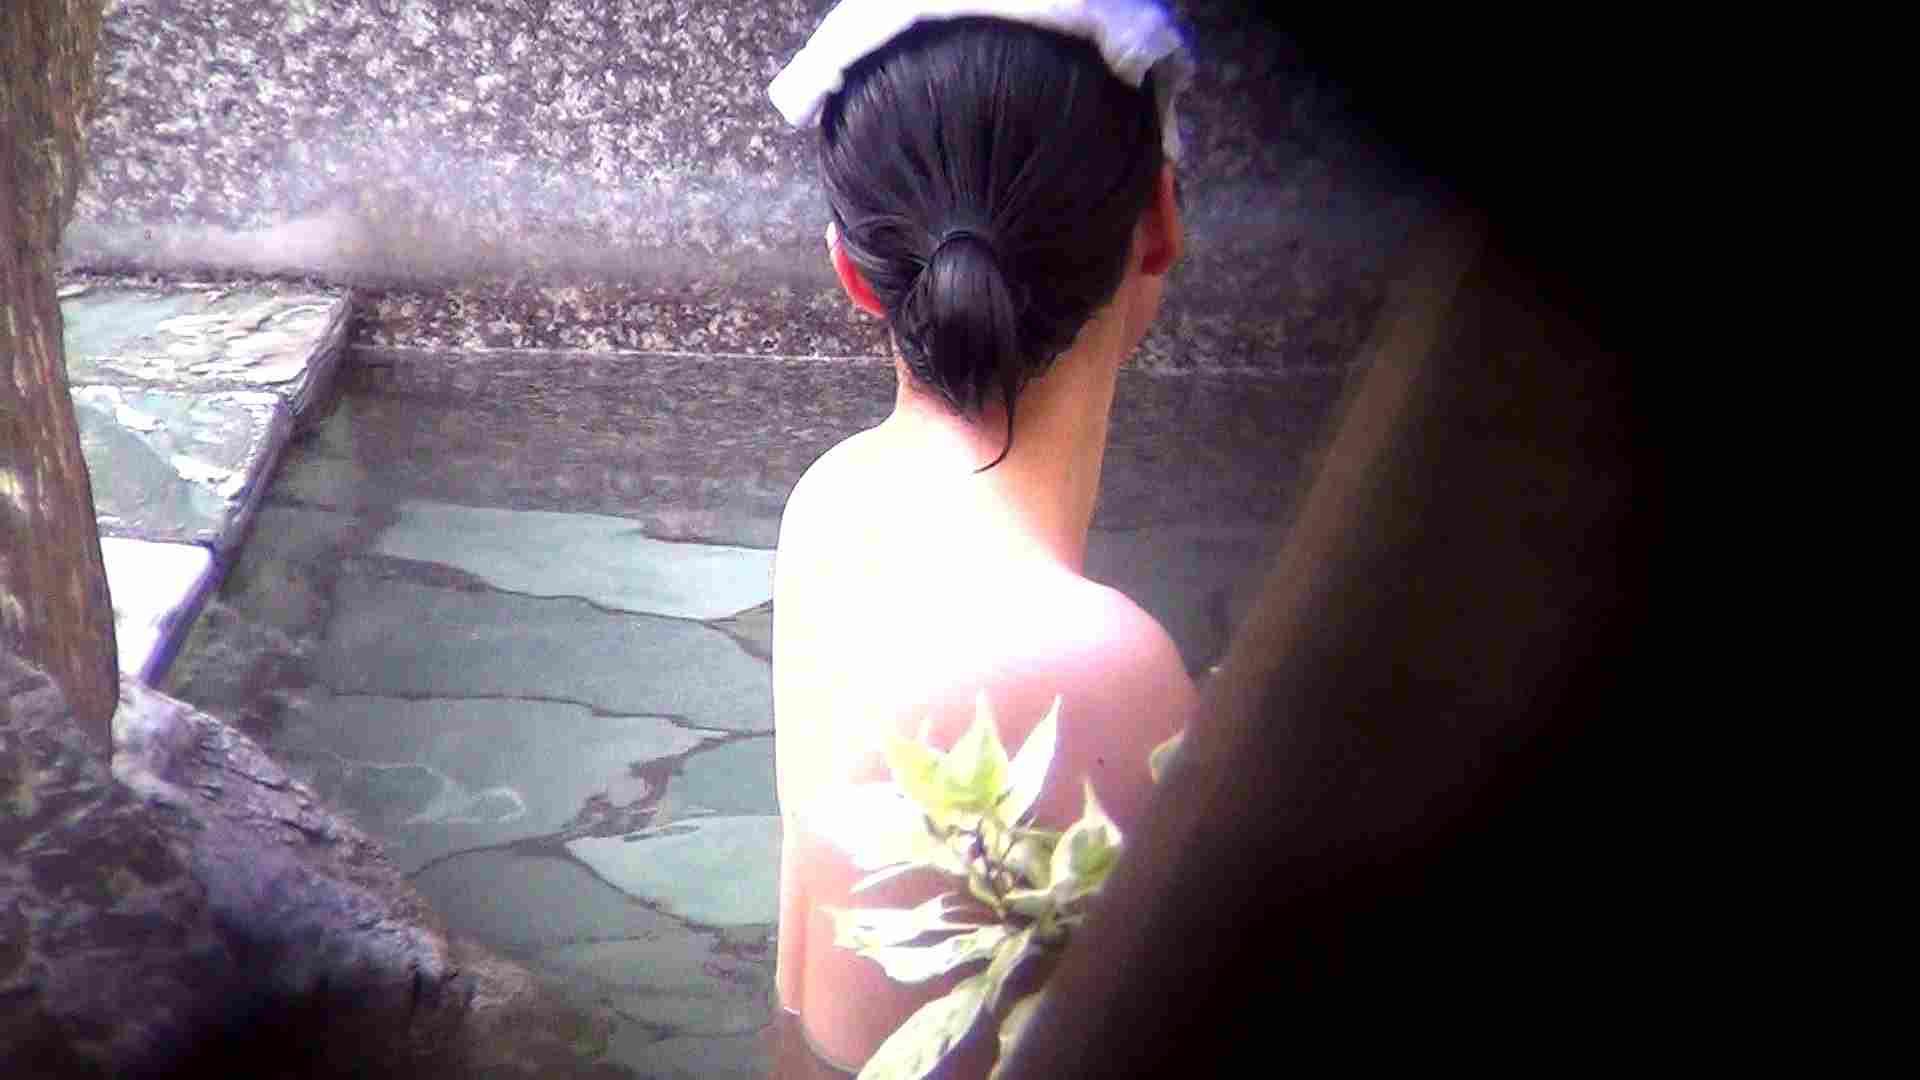 Vol.60 細身美女の股間から垂れているタコ糸 美乳 エロ画像 74画像 70